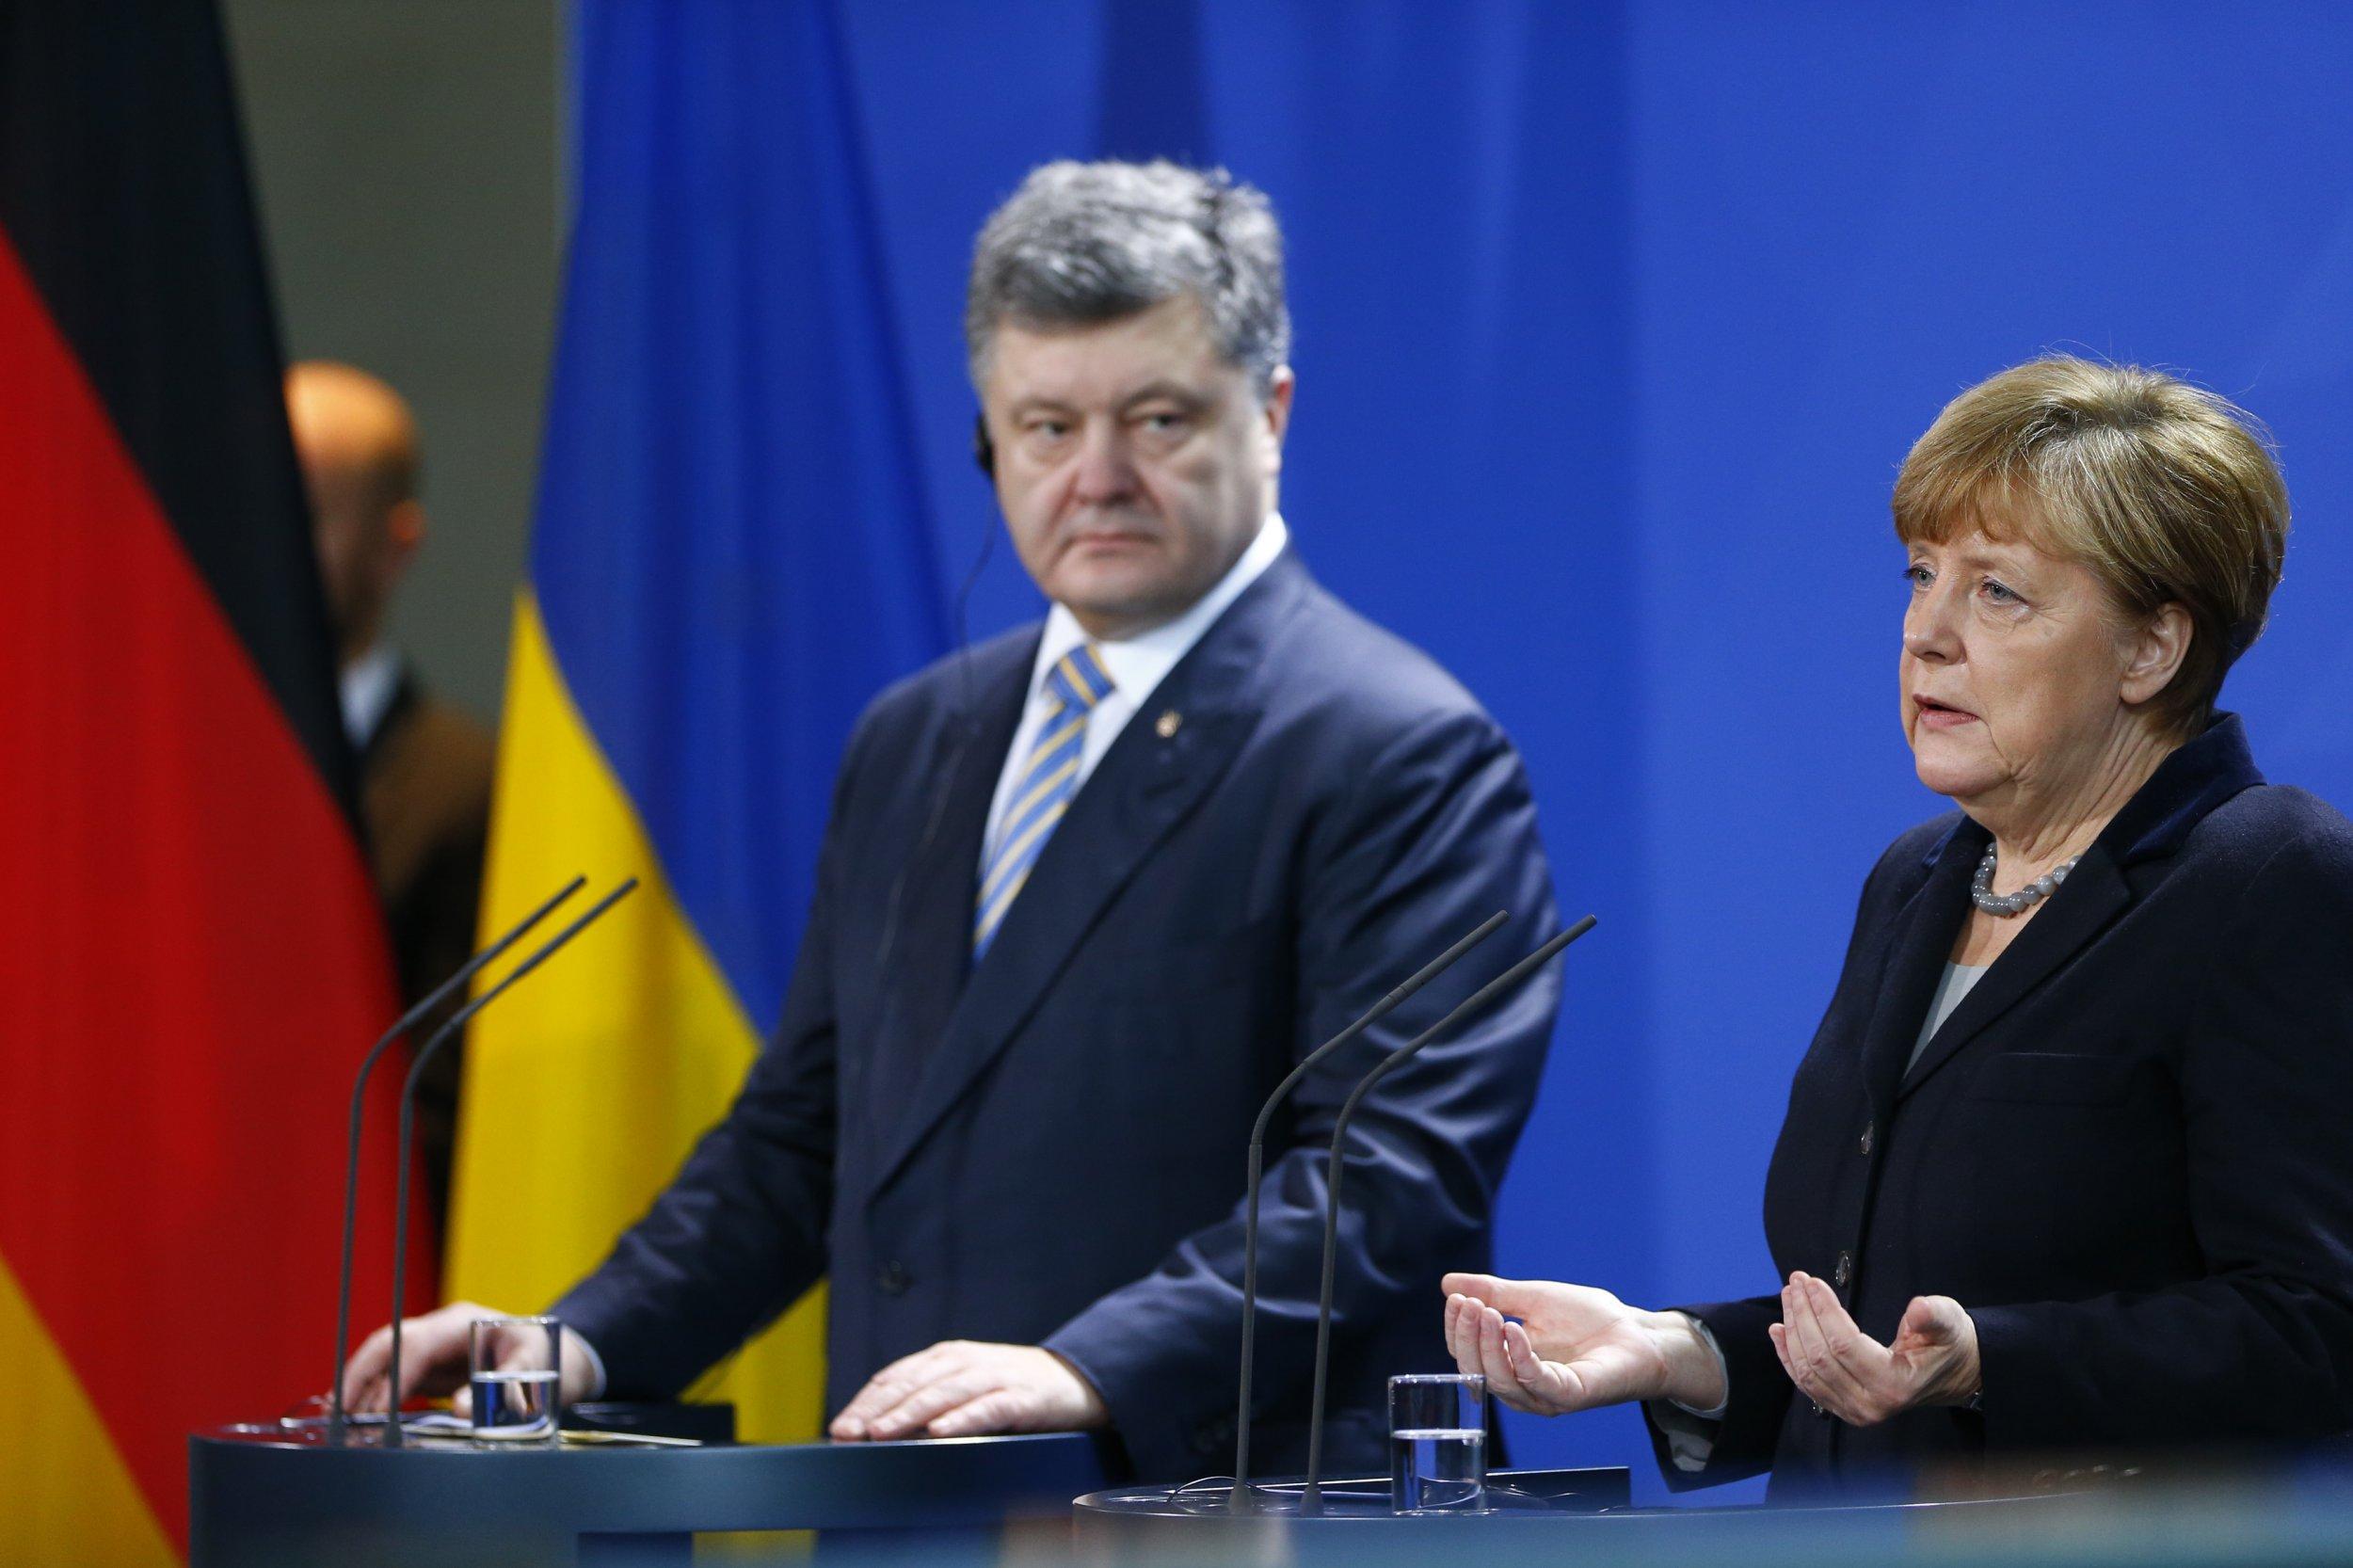 Poroshenko speaks next to German Chancellor Angela Merkel